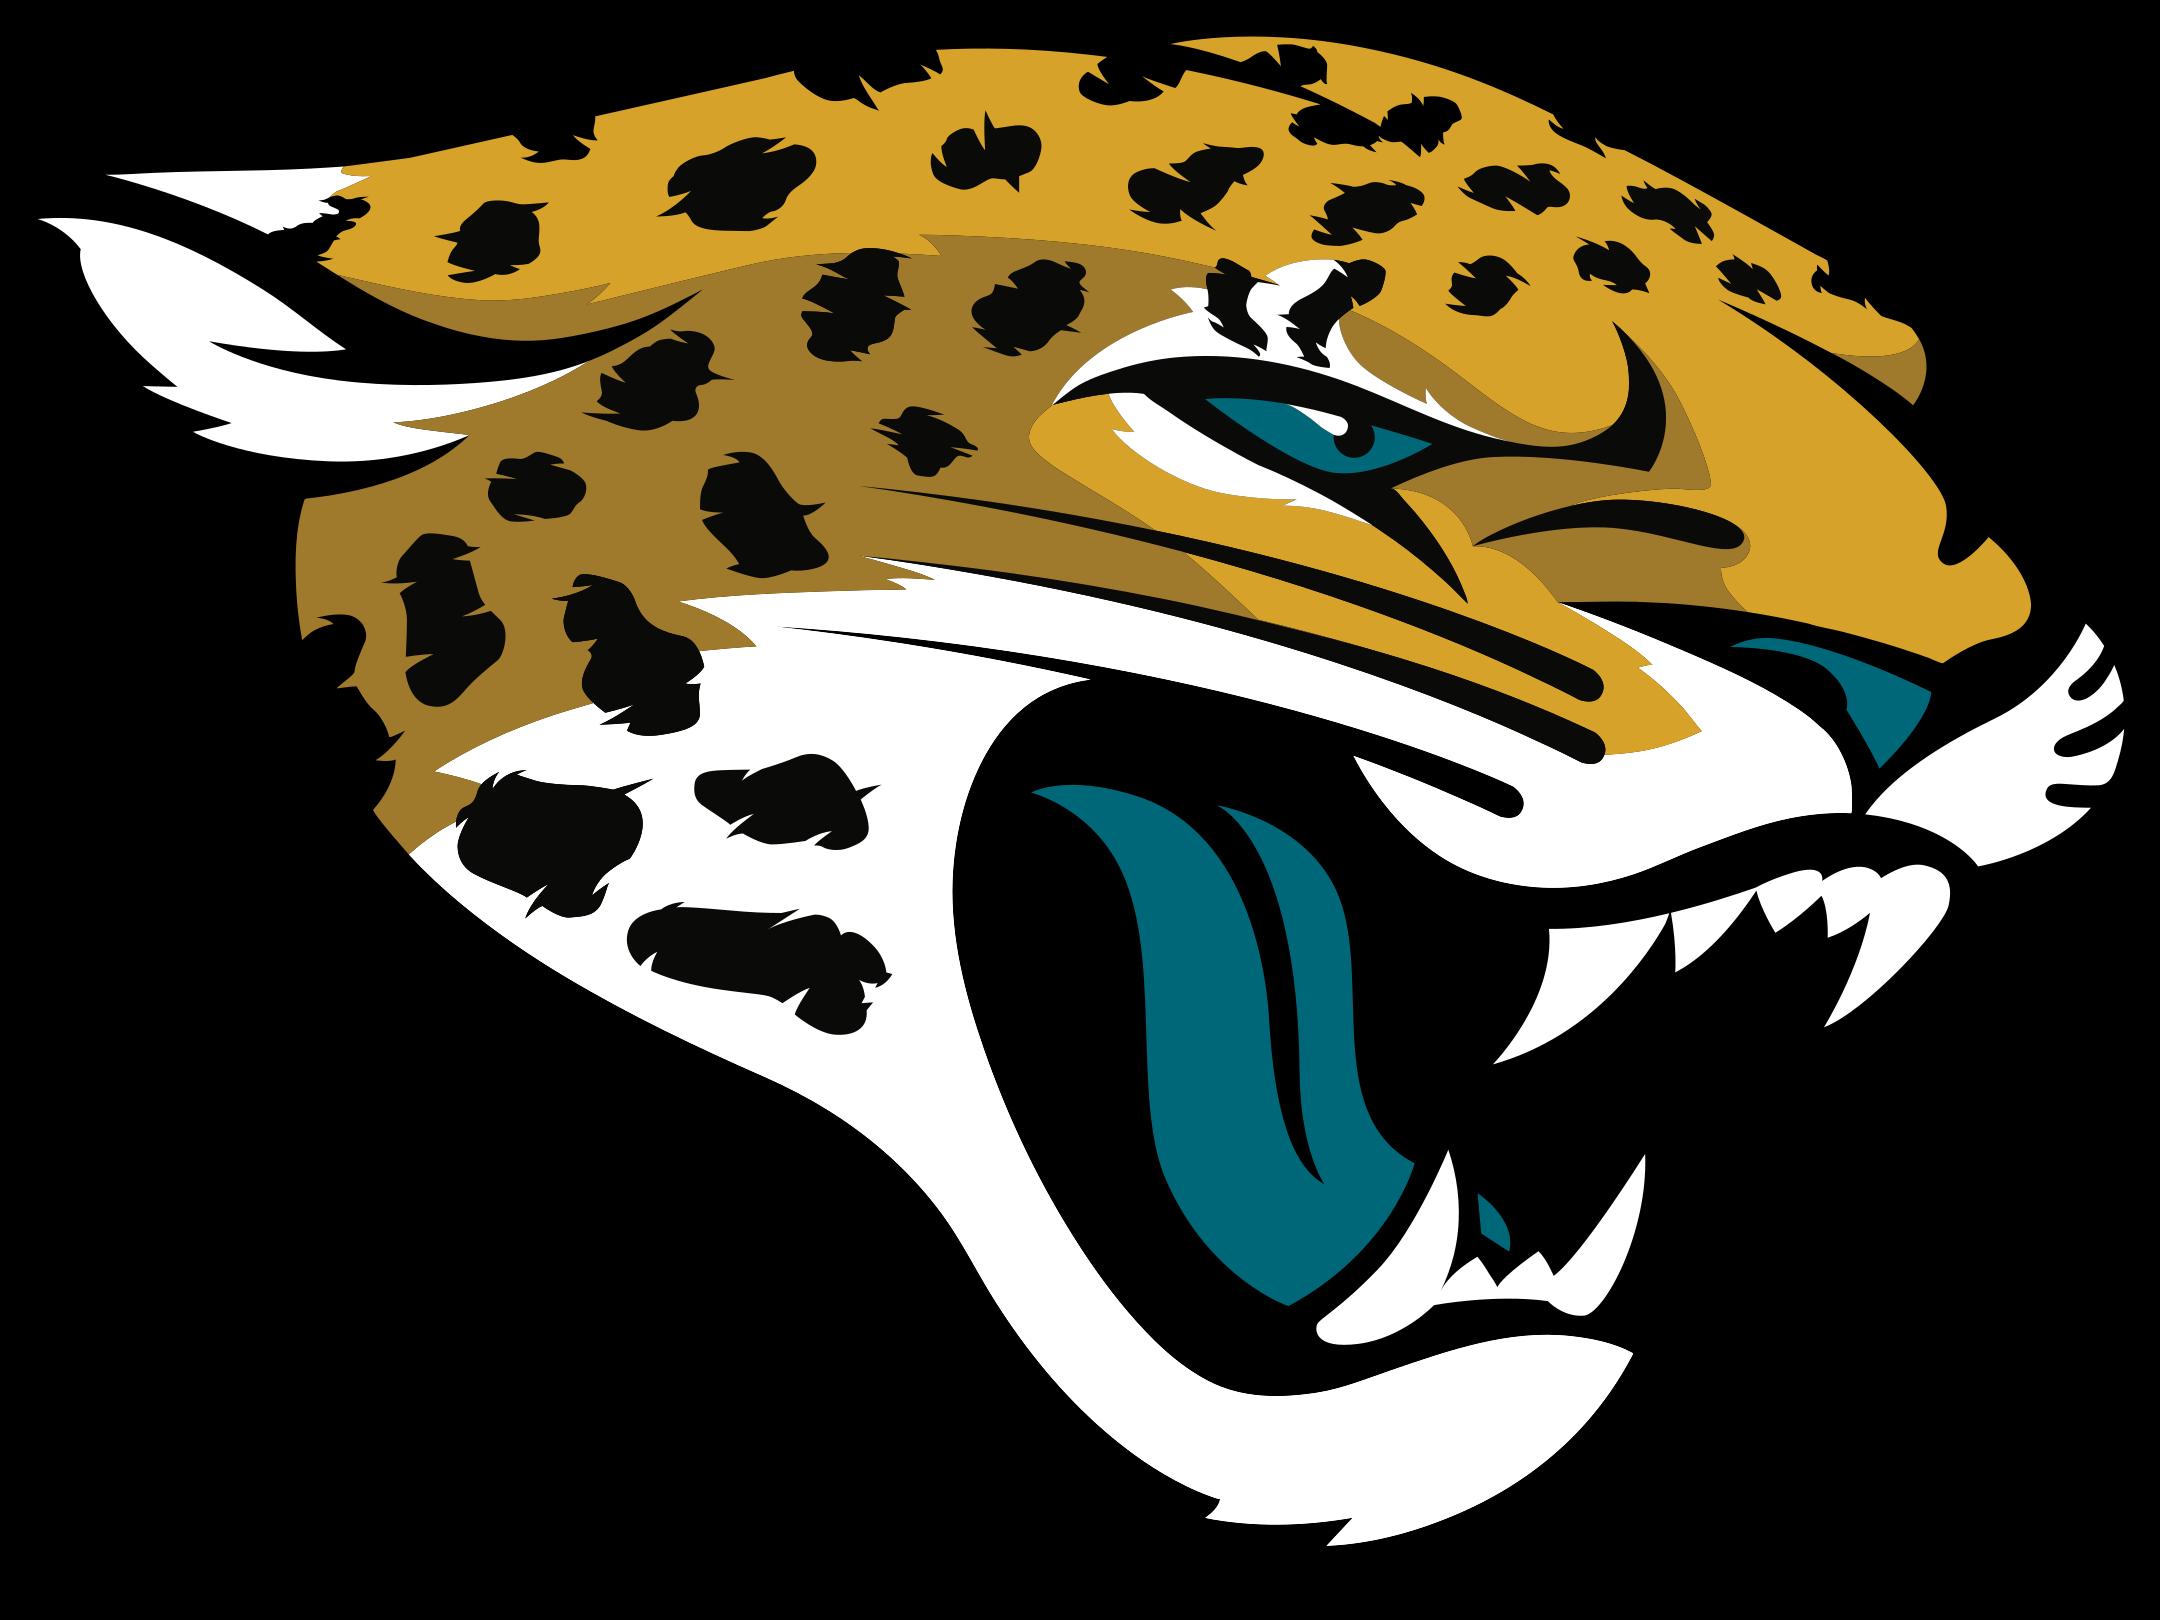 jacksonville jaguars logo 1 - Jacksonville Jaguars Logo